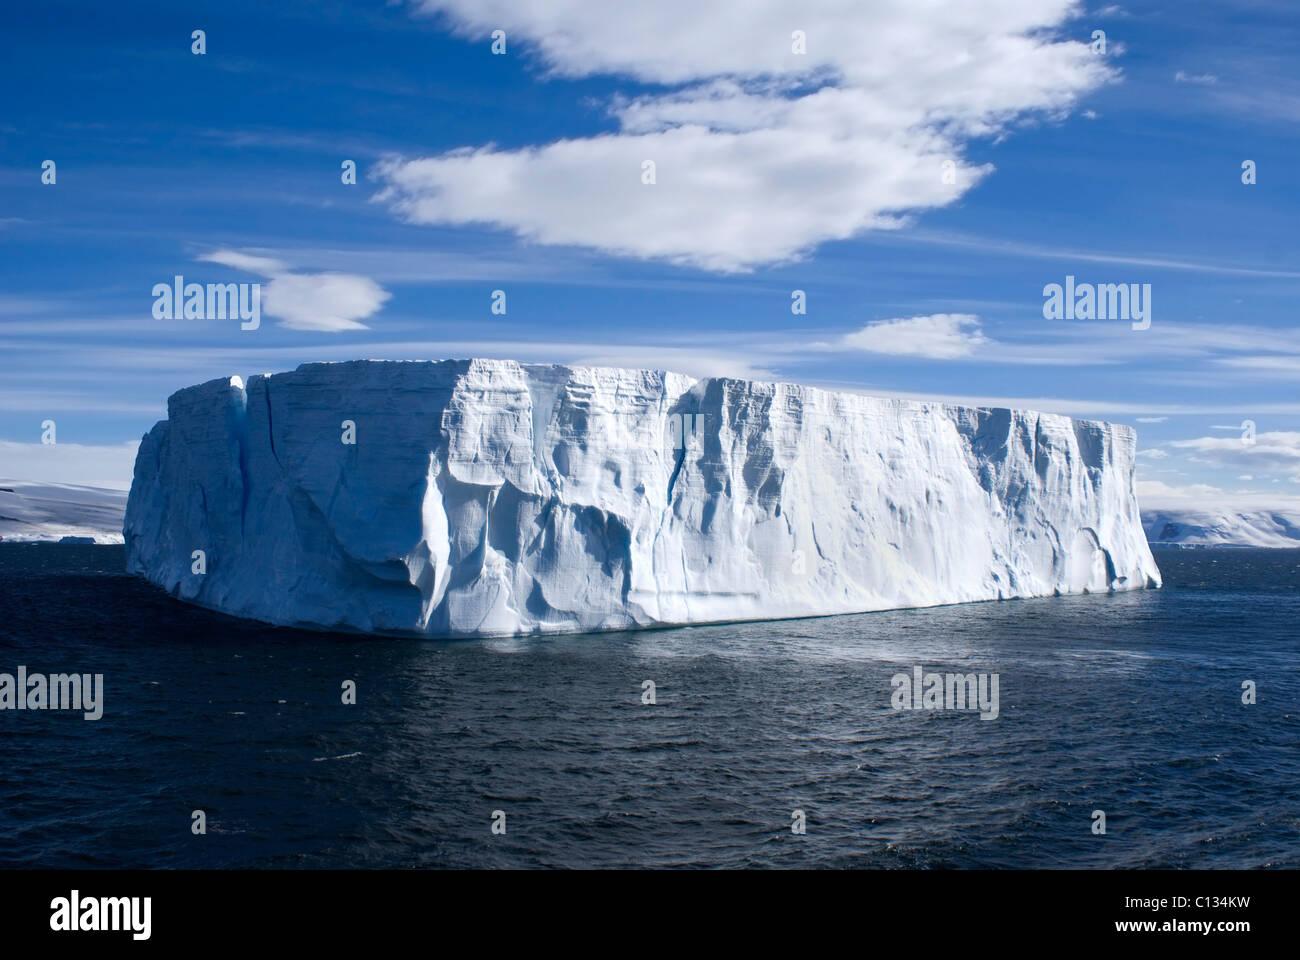 Grand iceberg tableture avec ciel bleu clair prise à l'Antarctique. Photo Stock